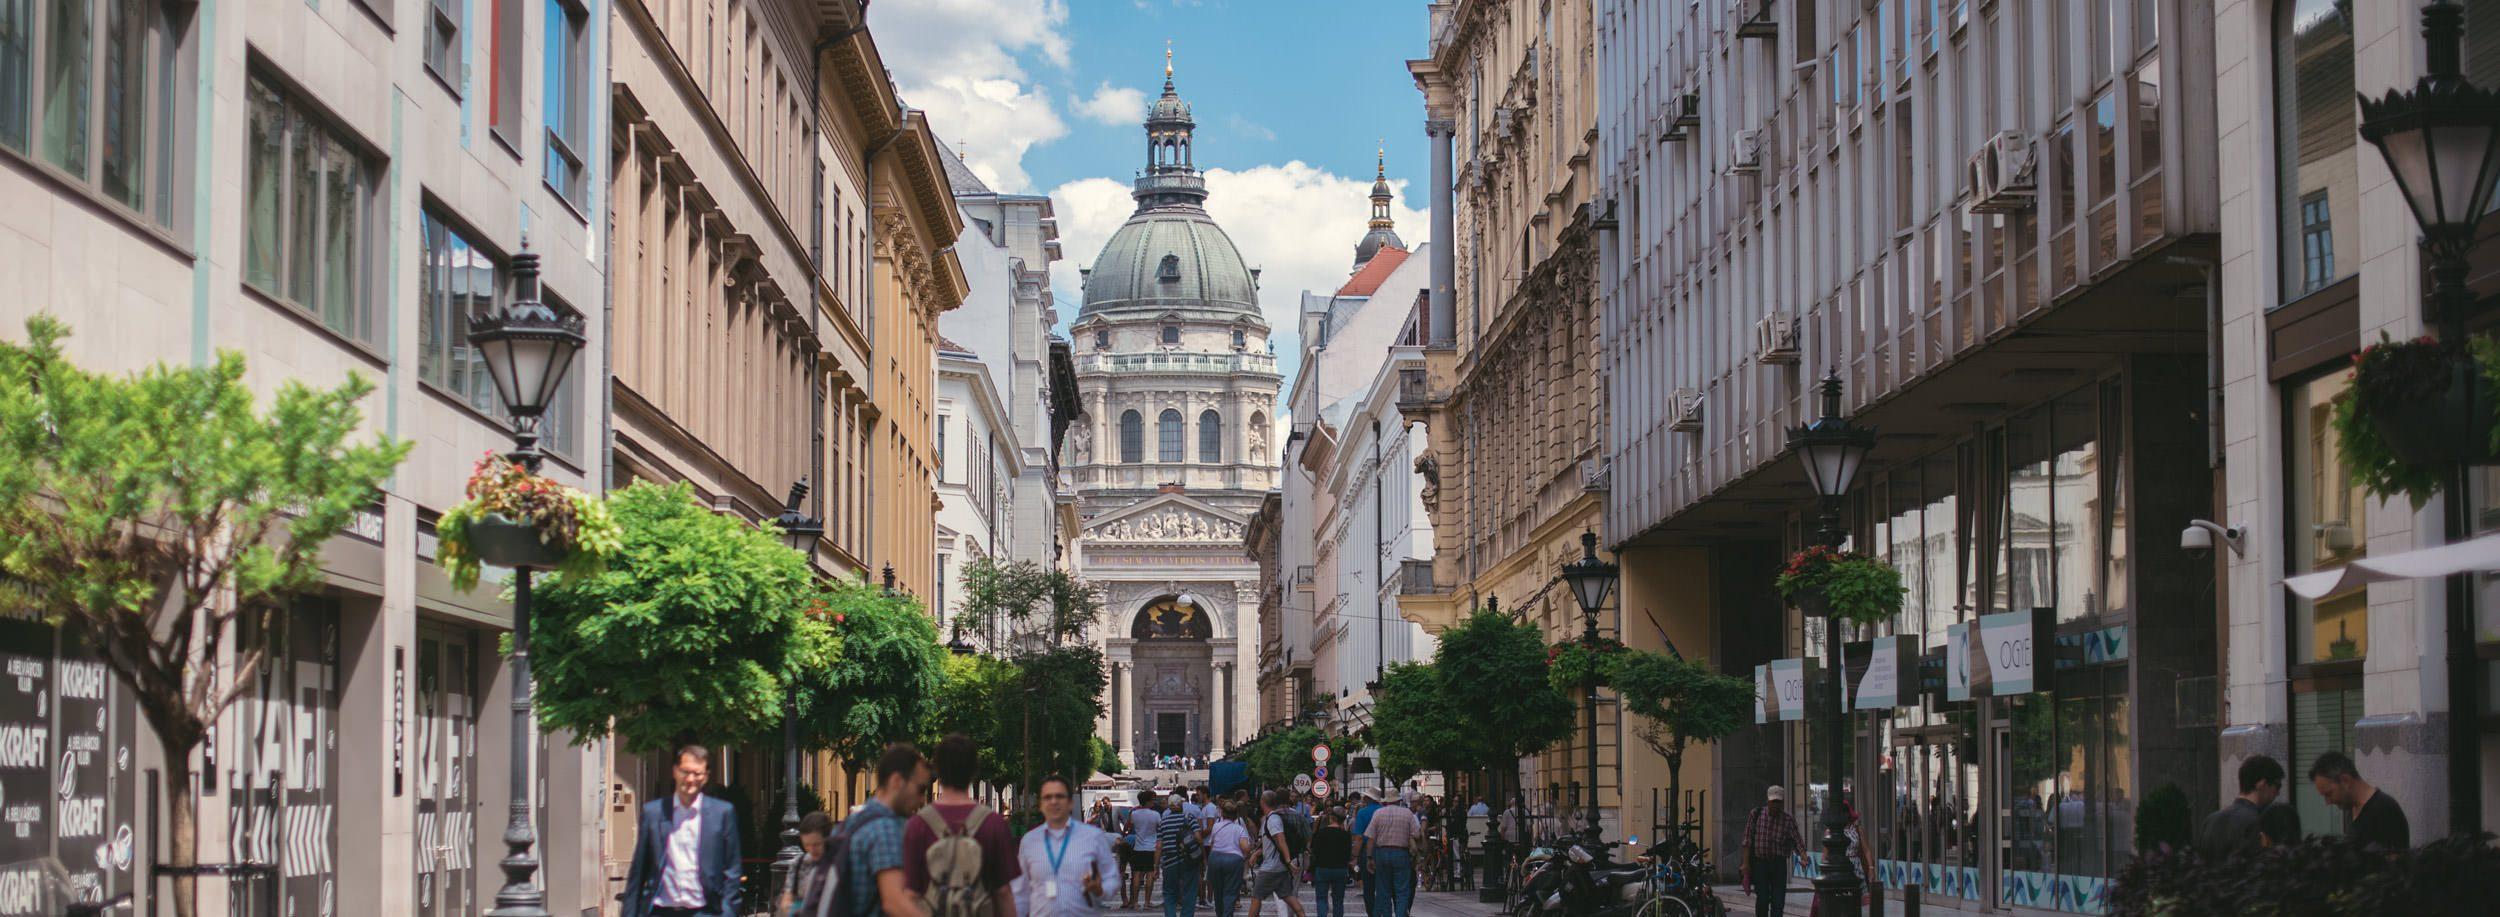 budapeszt-katedra